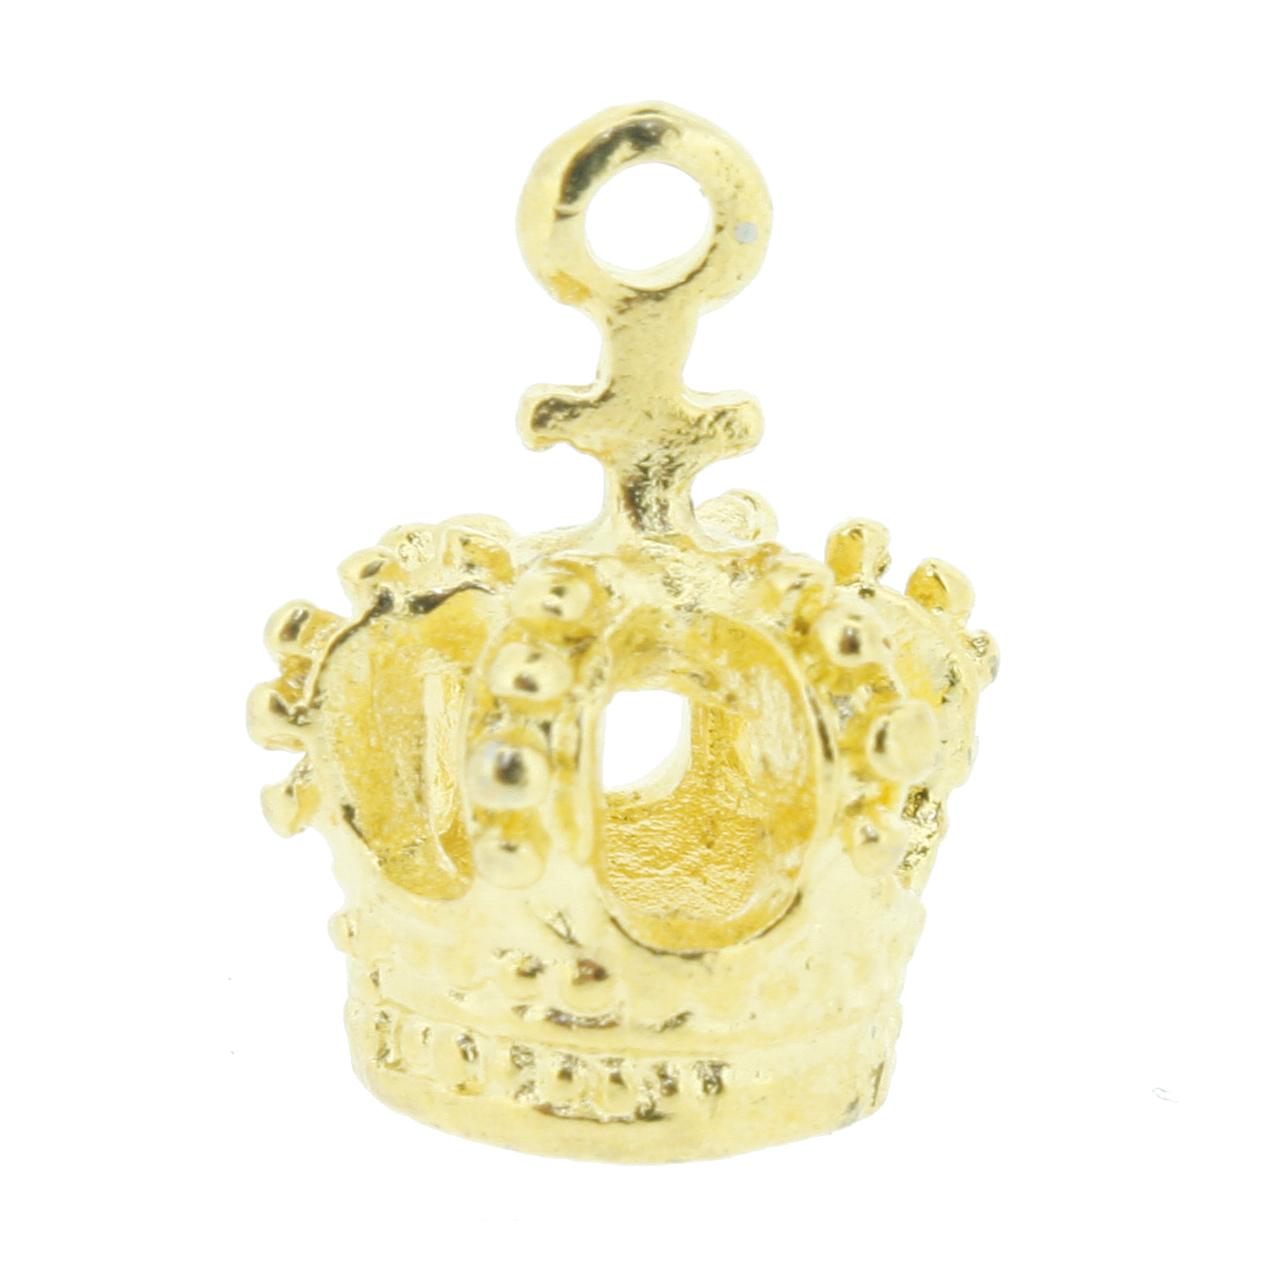 Coroa Dourada - 16mm  - Universo Religioso® - Artigos de Umbanda e Candomblé